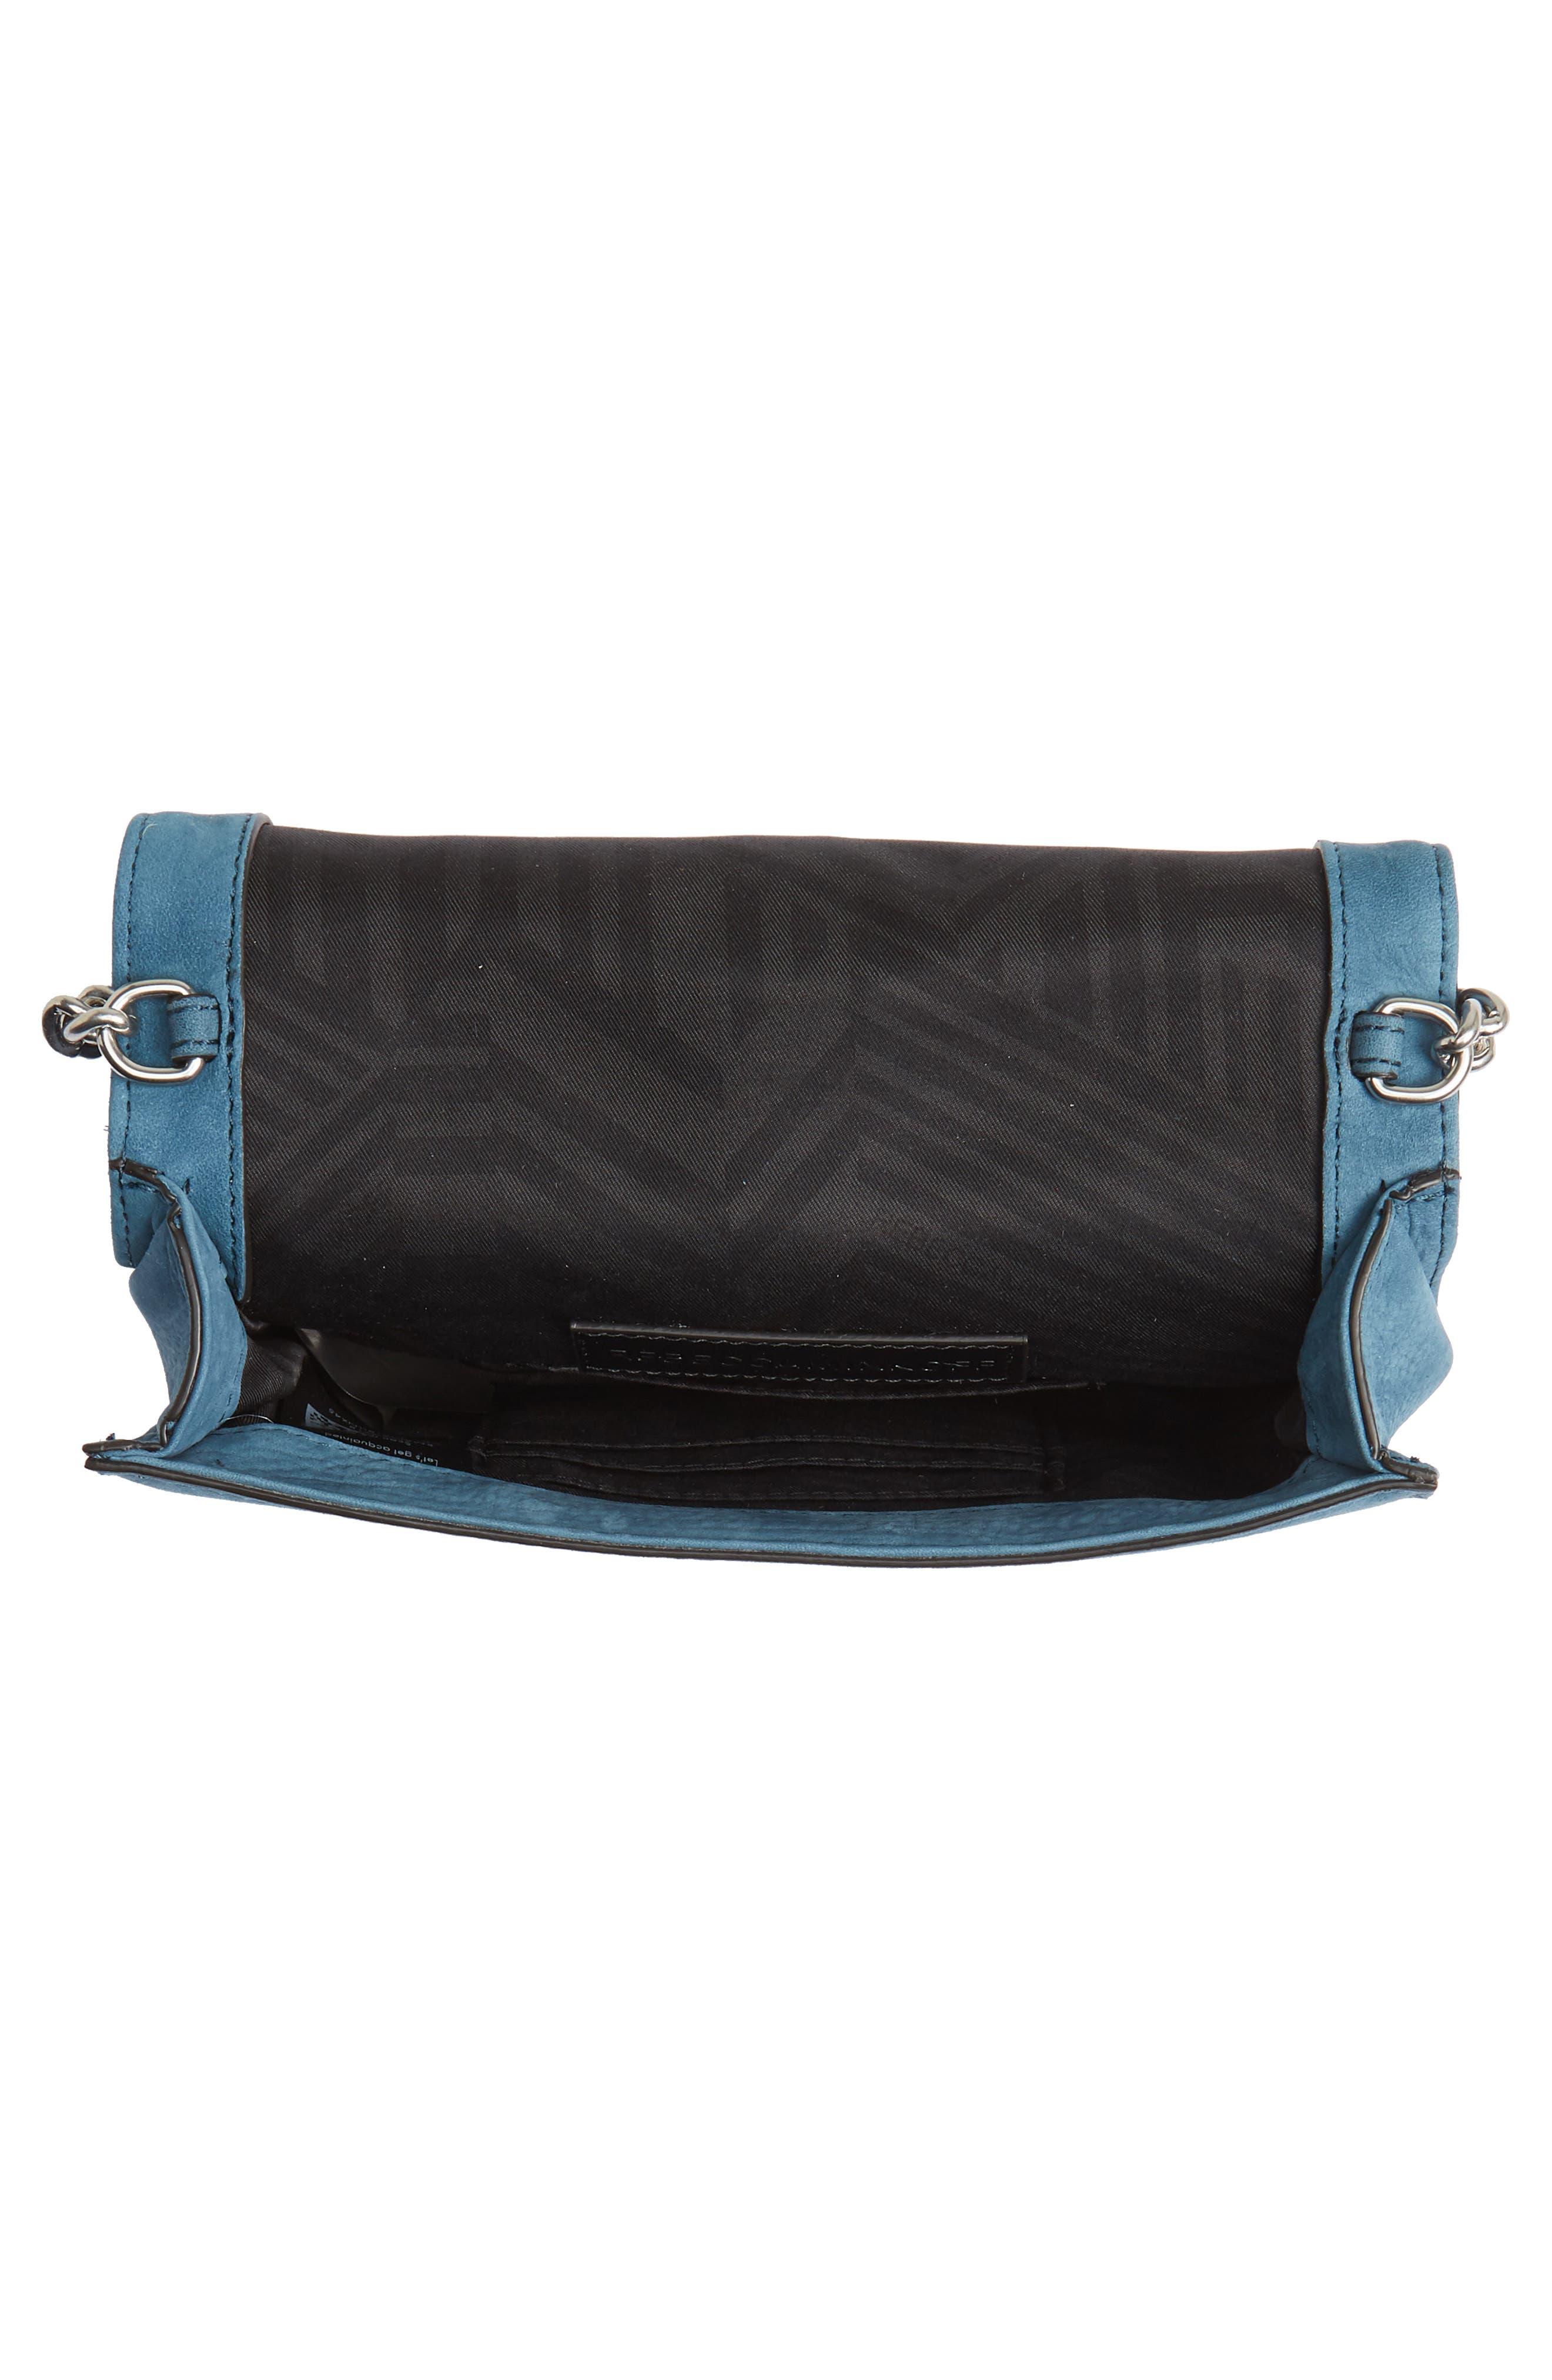 Small Love Nubuck Leather Crossbody Bag,                             Alternate thumbnail 18, color,